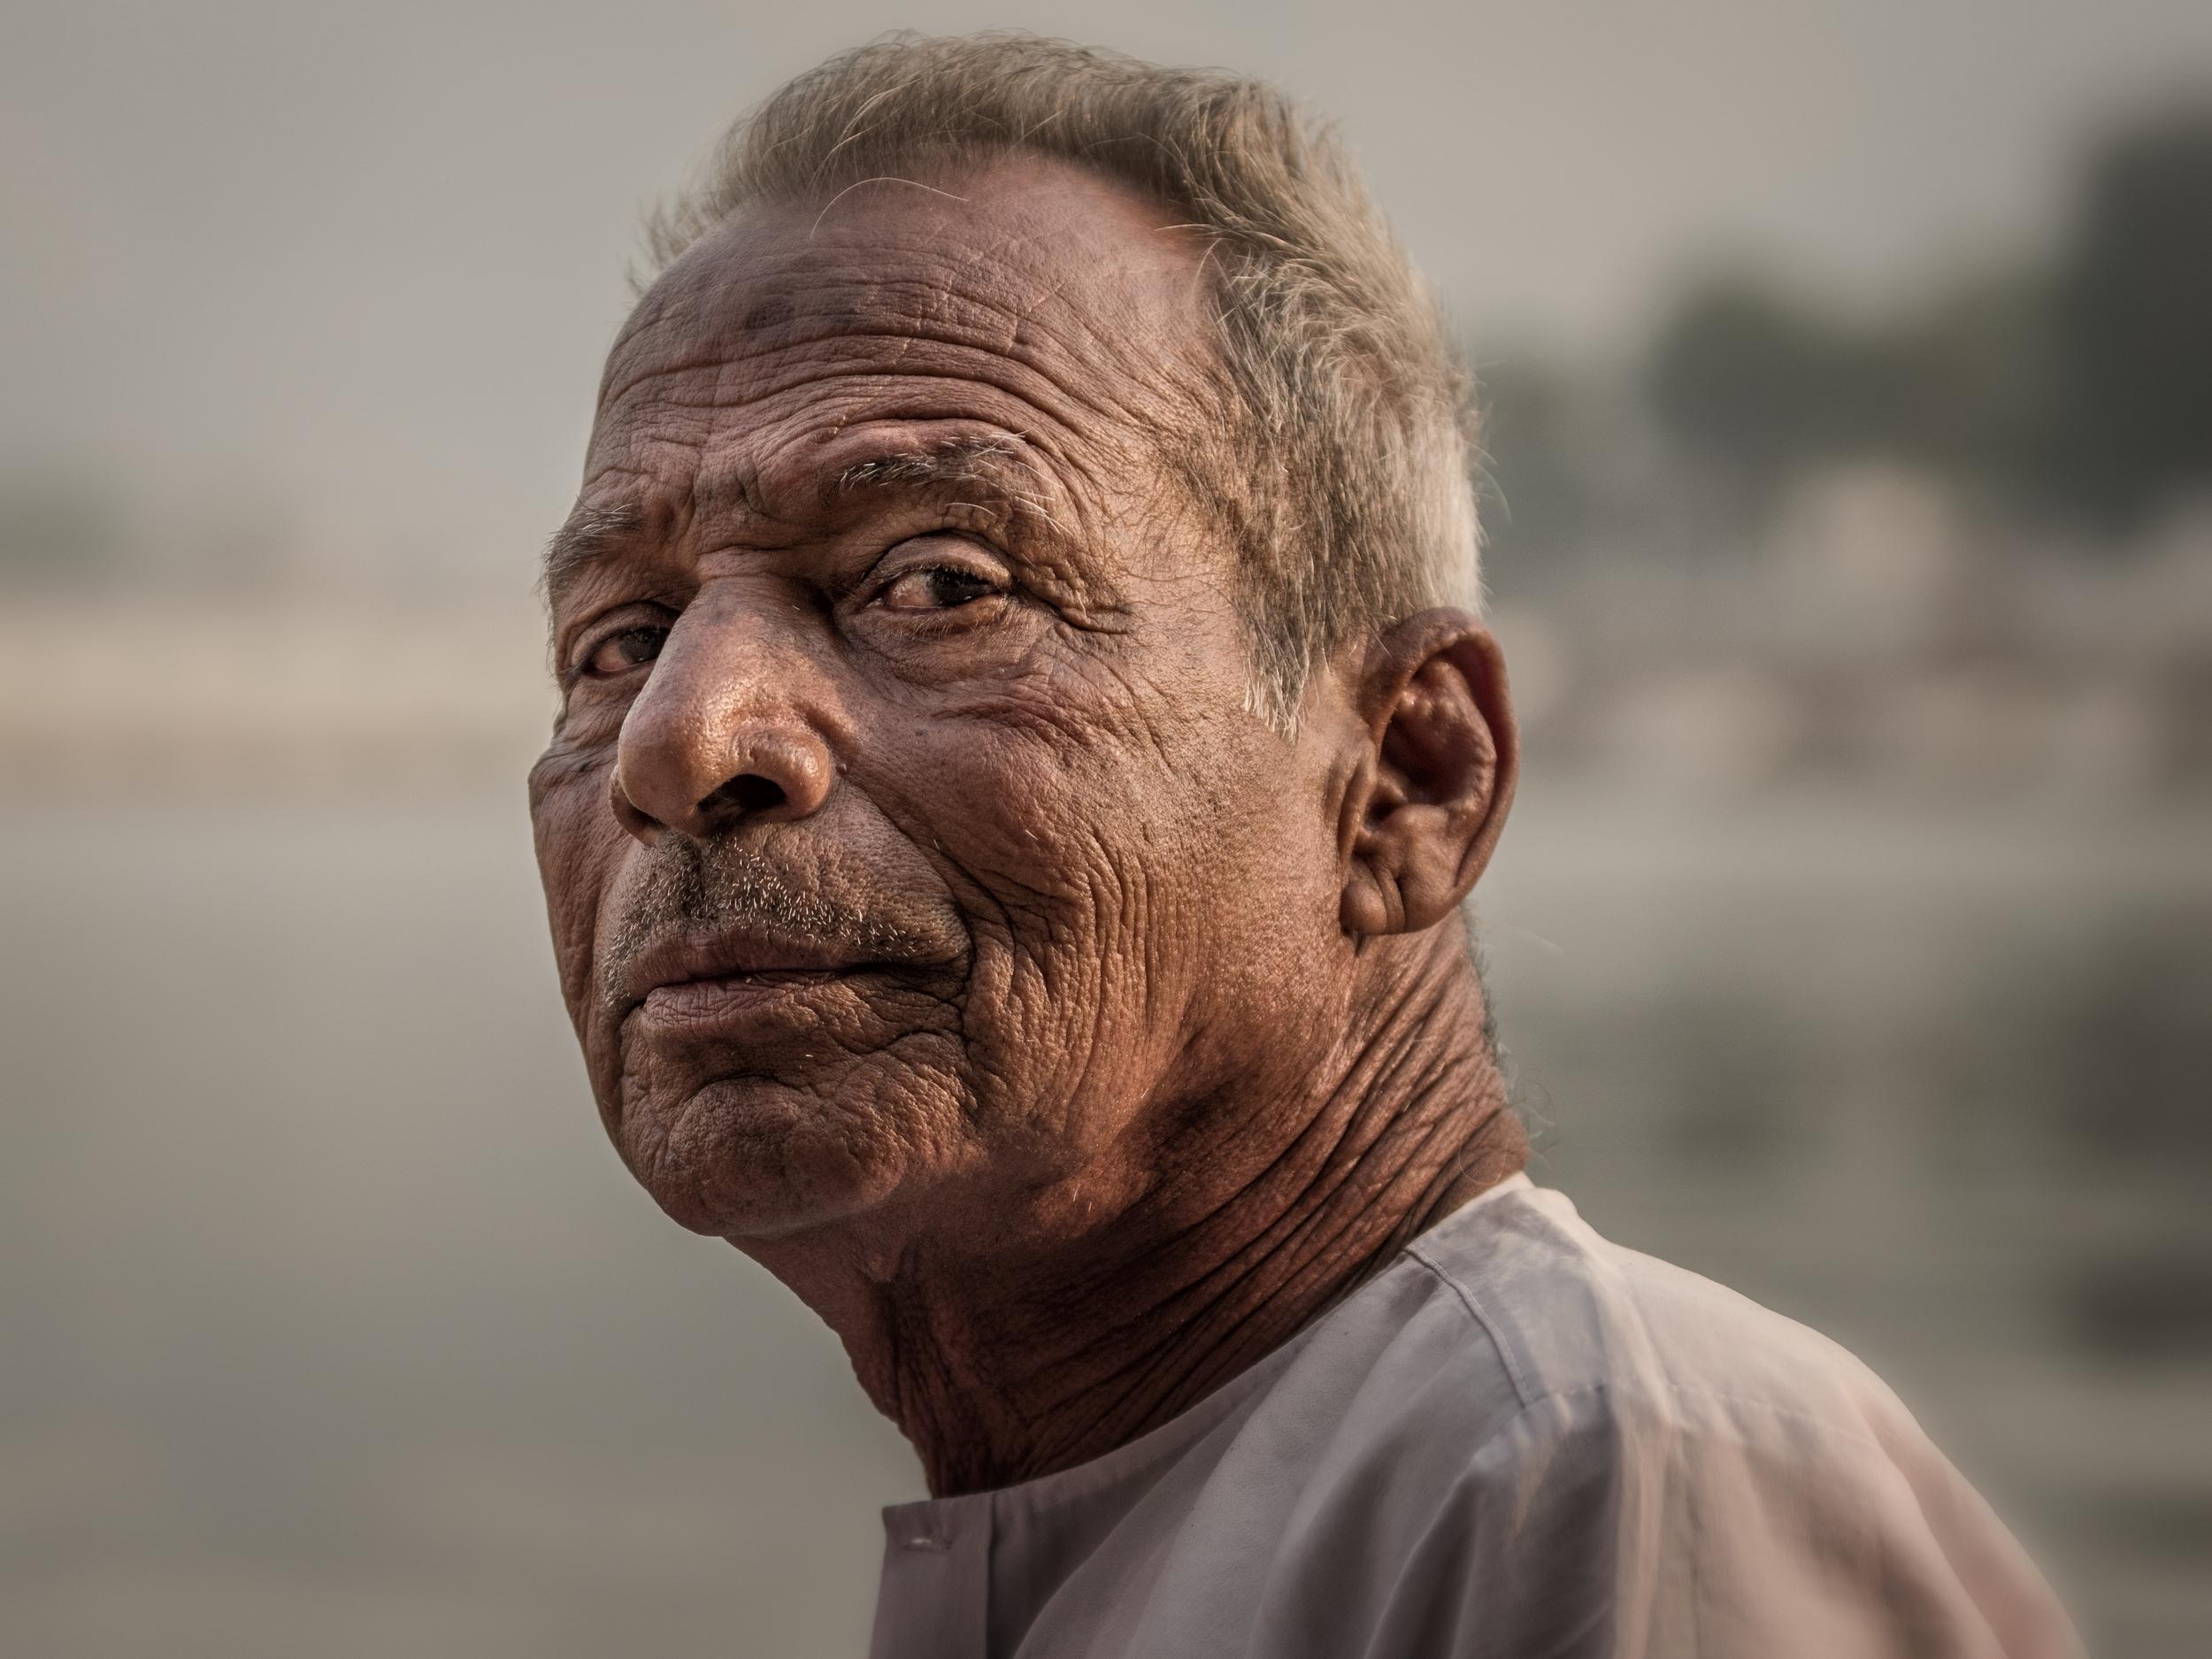 PUSHKAR, INDIA